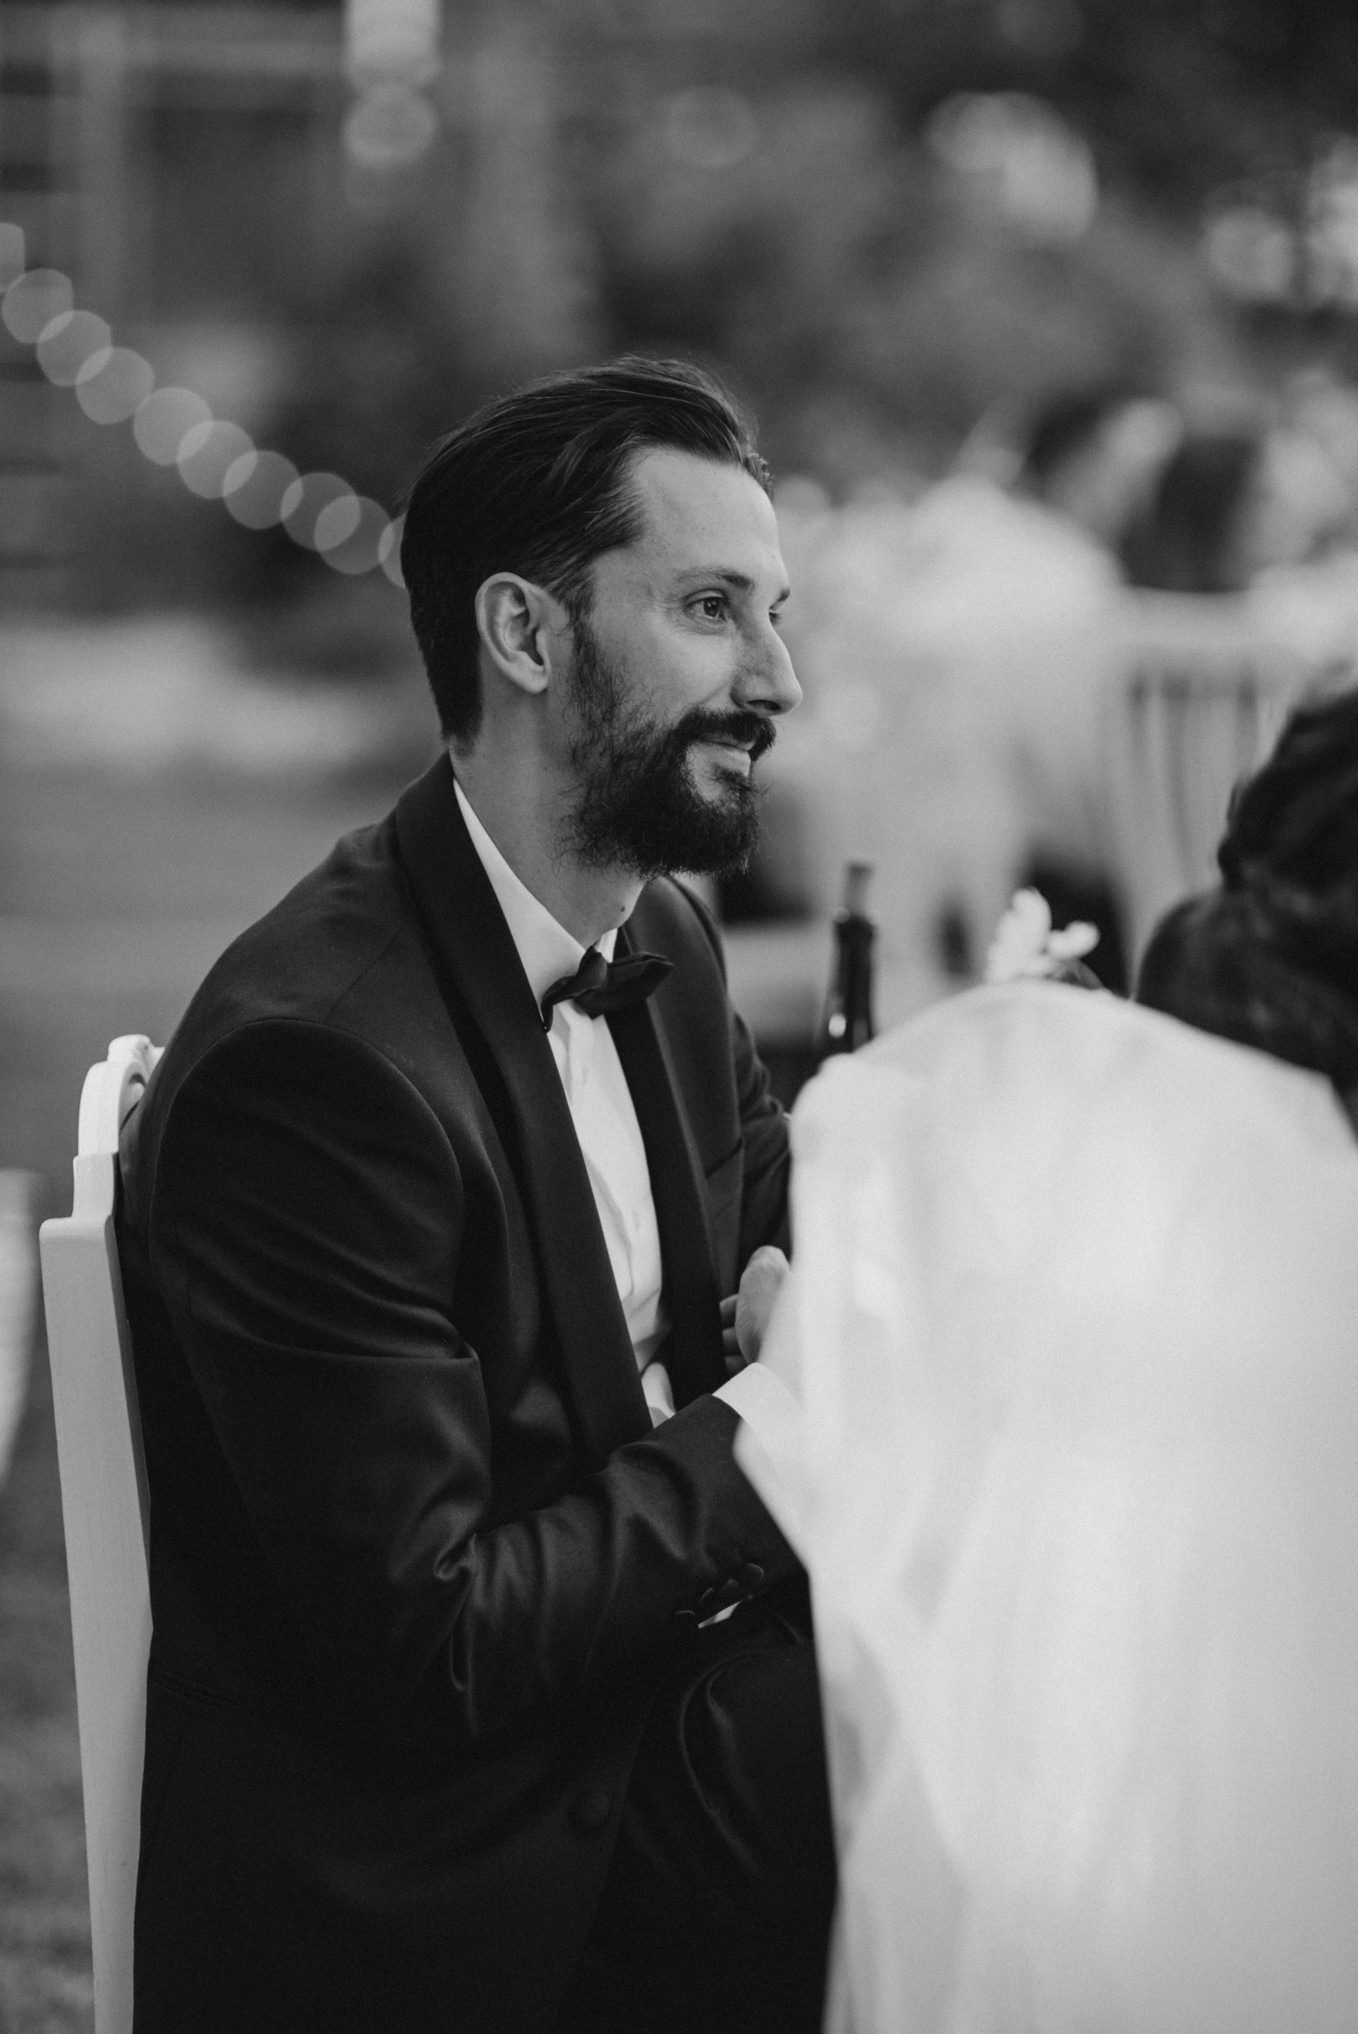 groom listening to speeches at wedding